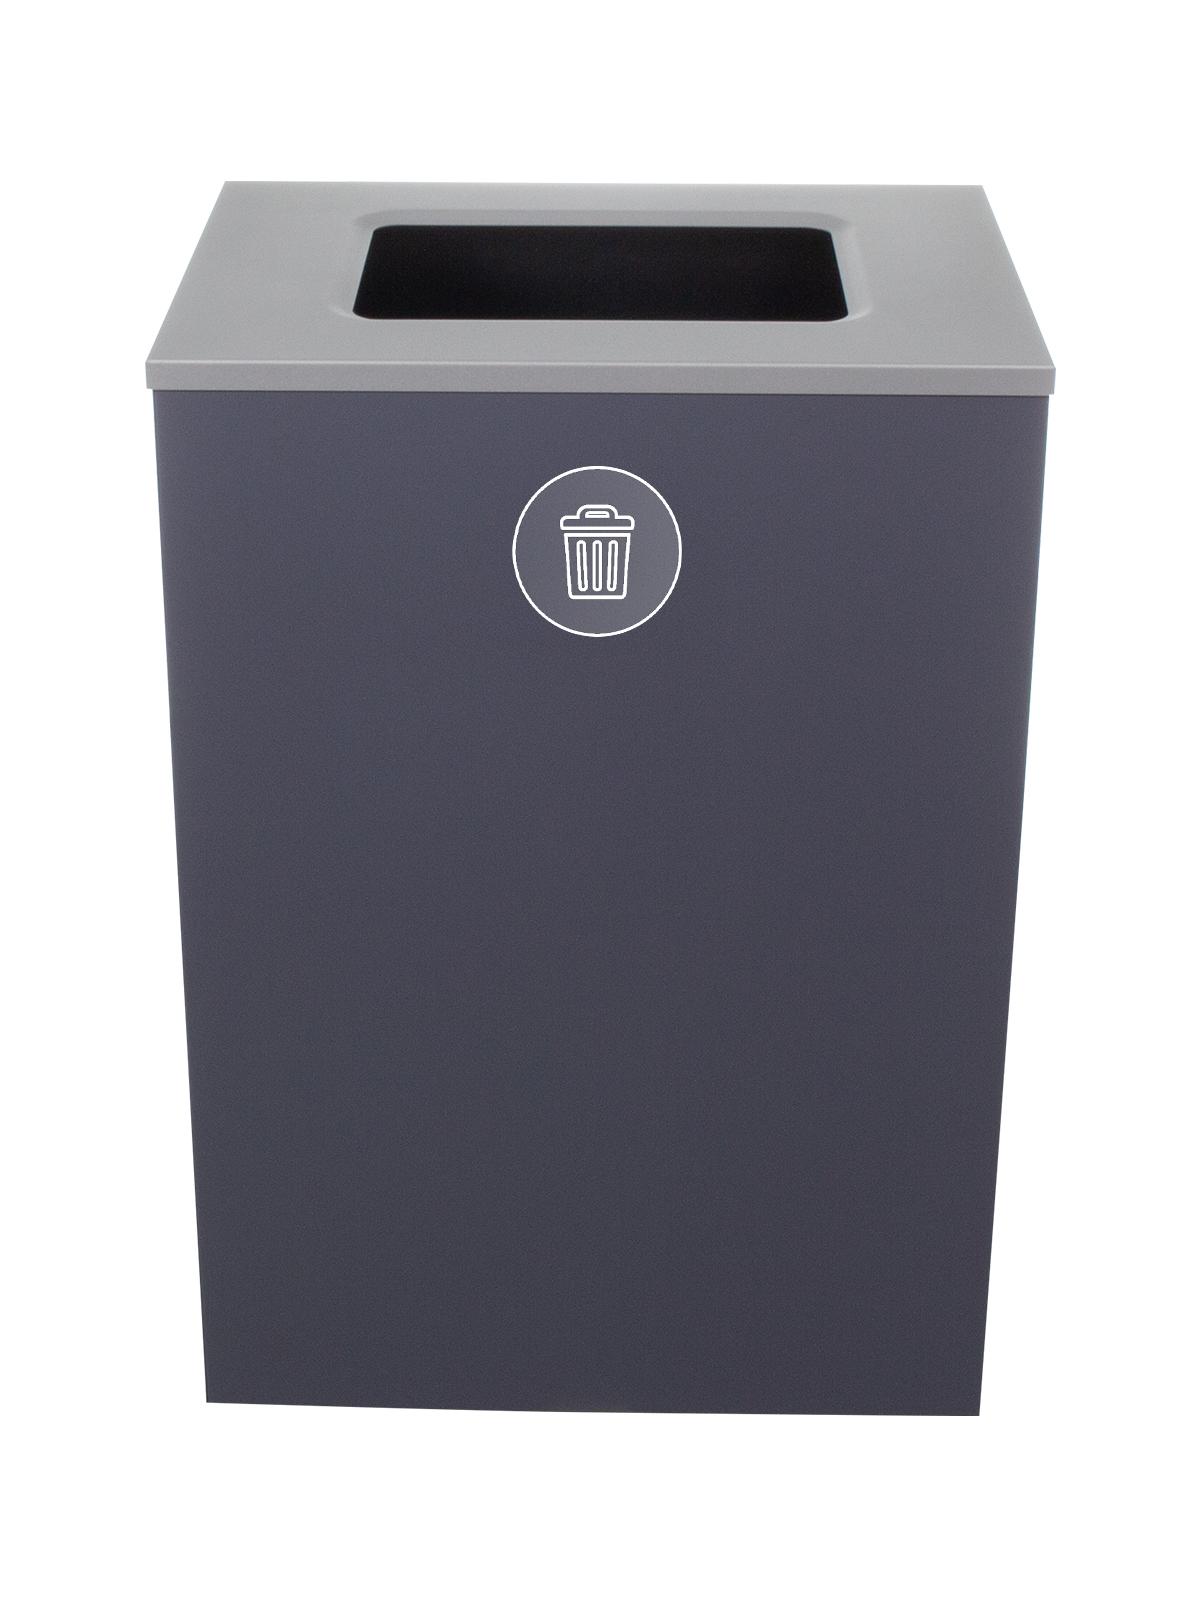 SPECTRUM - Single - Cube Xl - Waste - Full - Grey-Silver